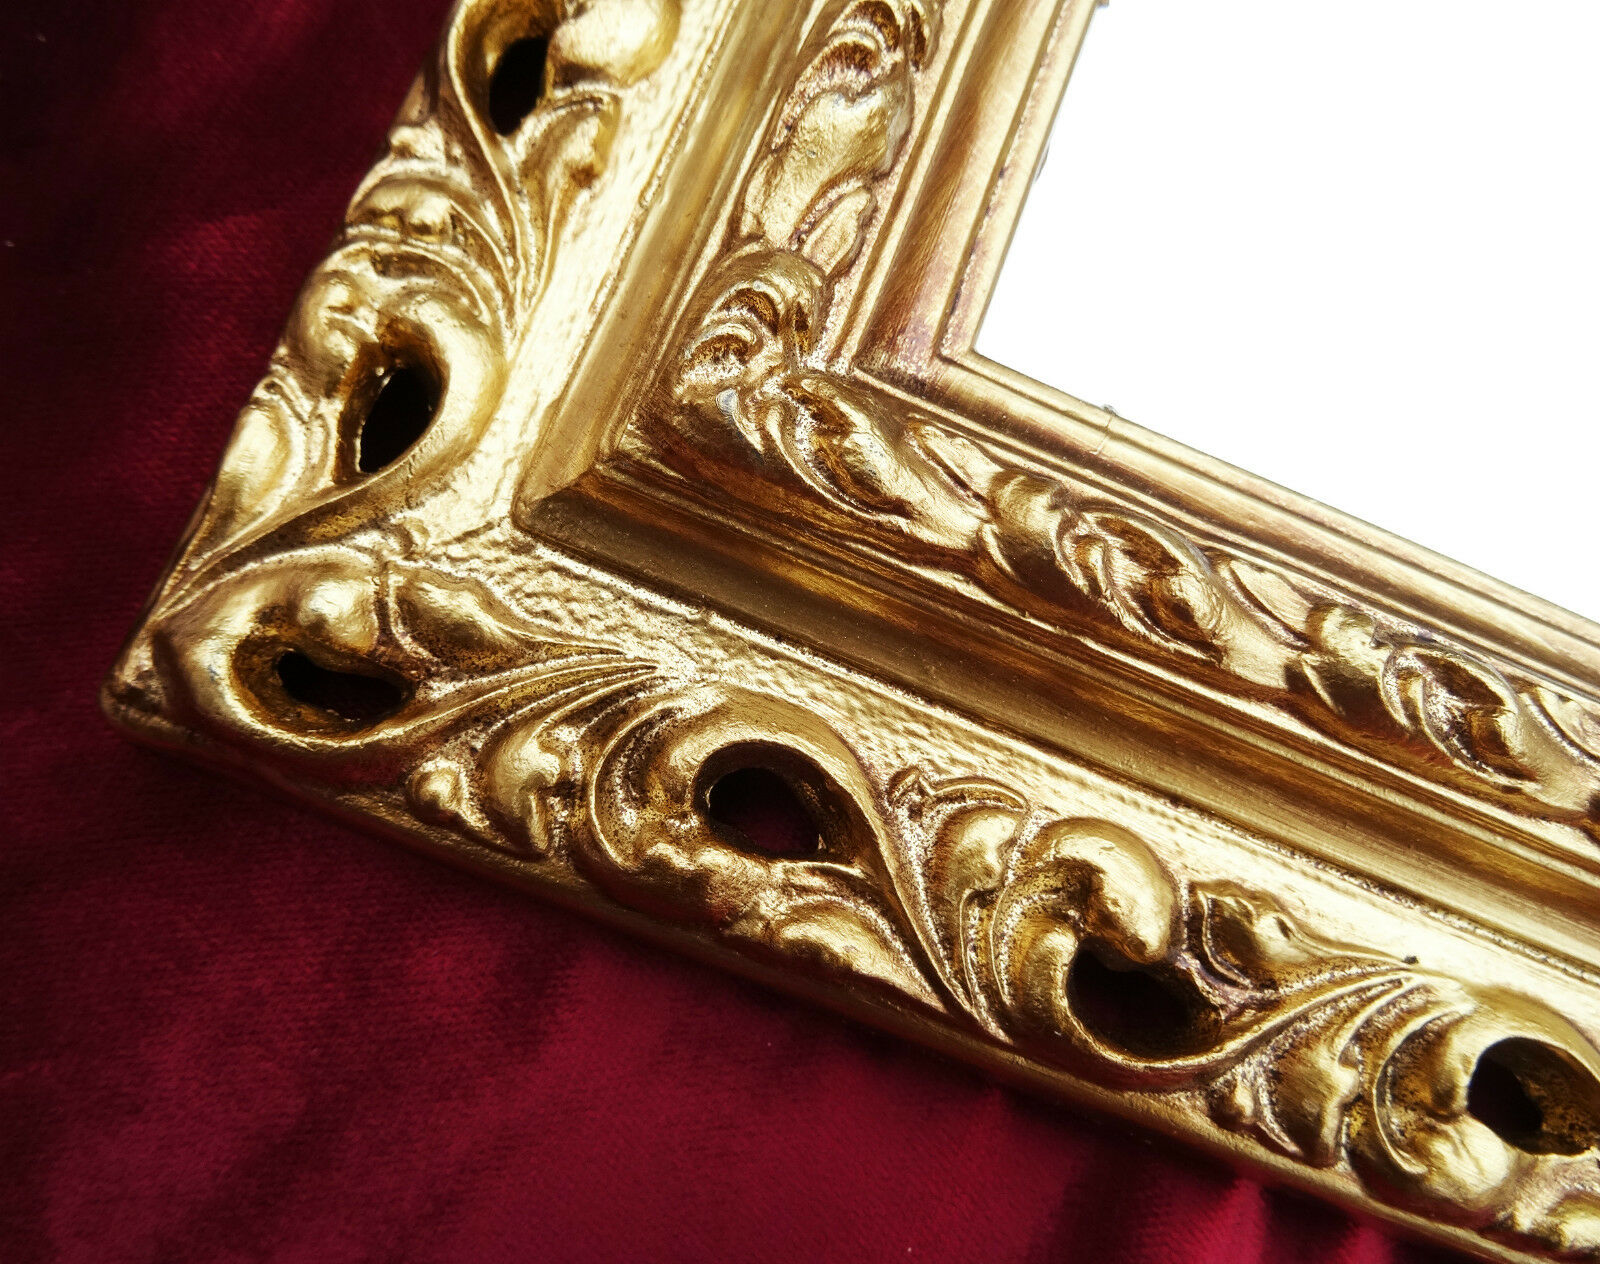 wall mirror 43x36 mirror baroque rectangular gold picture frame arabesco 3 ebay. Black Bedroom Furniture Sets. Home Design Ideas